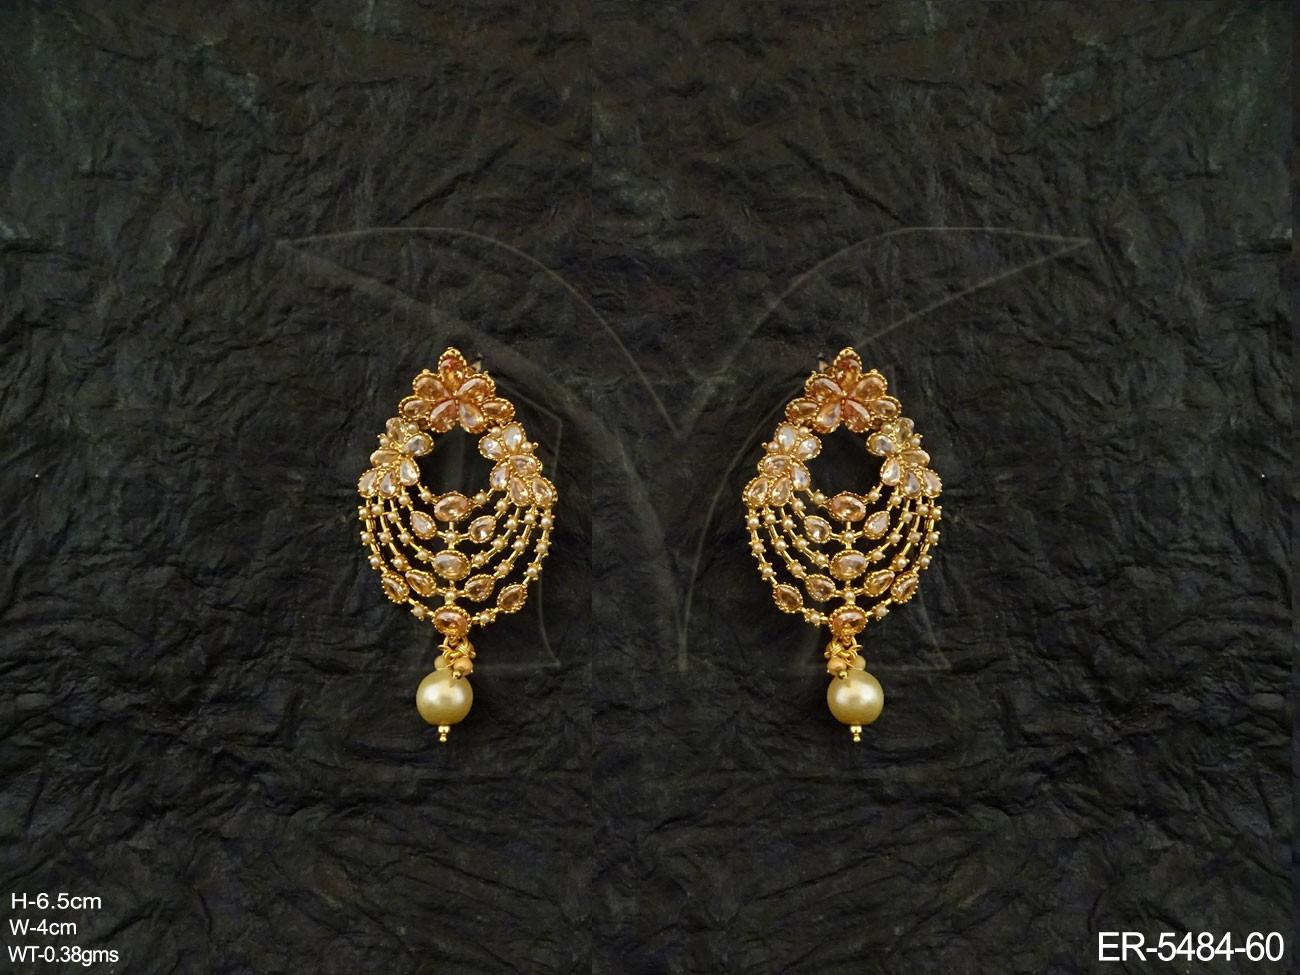 Royal Antique Earrings Jewellery